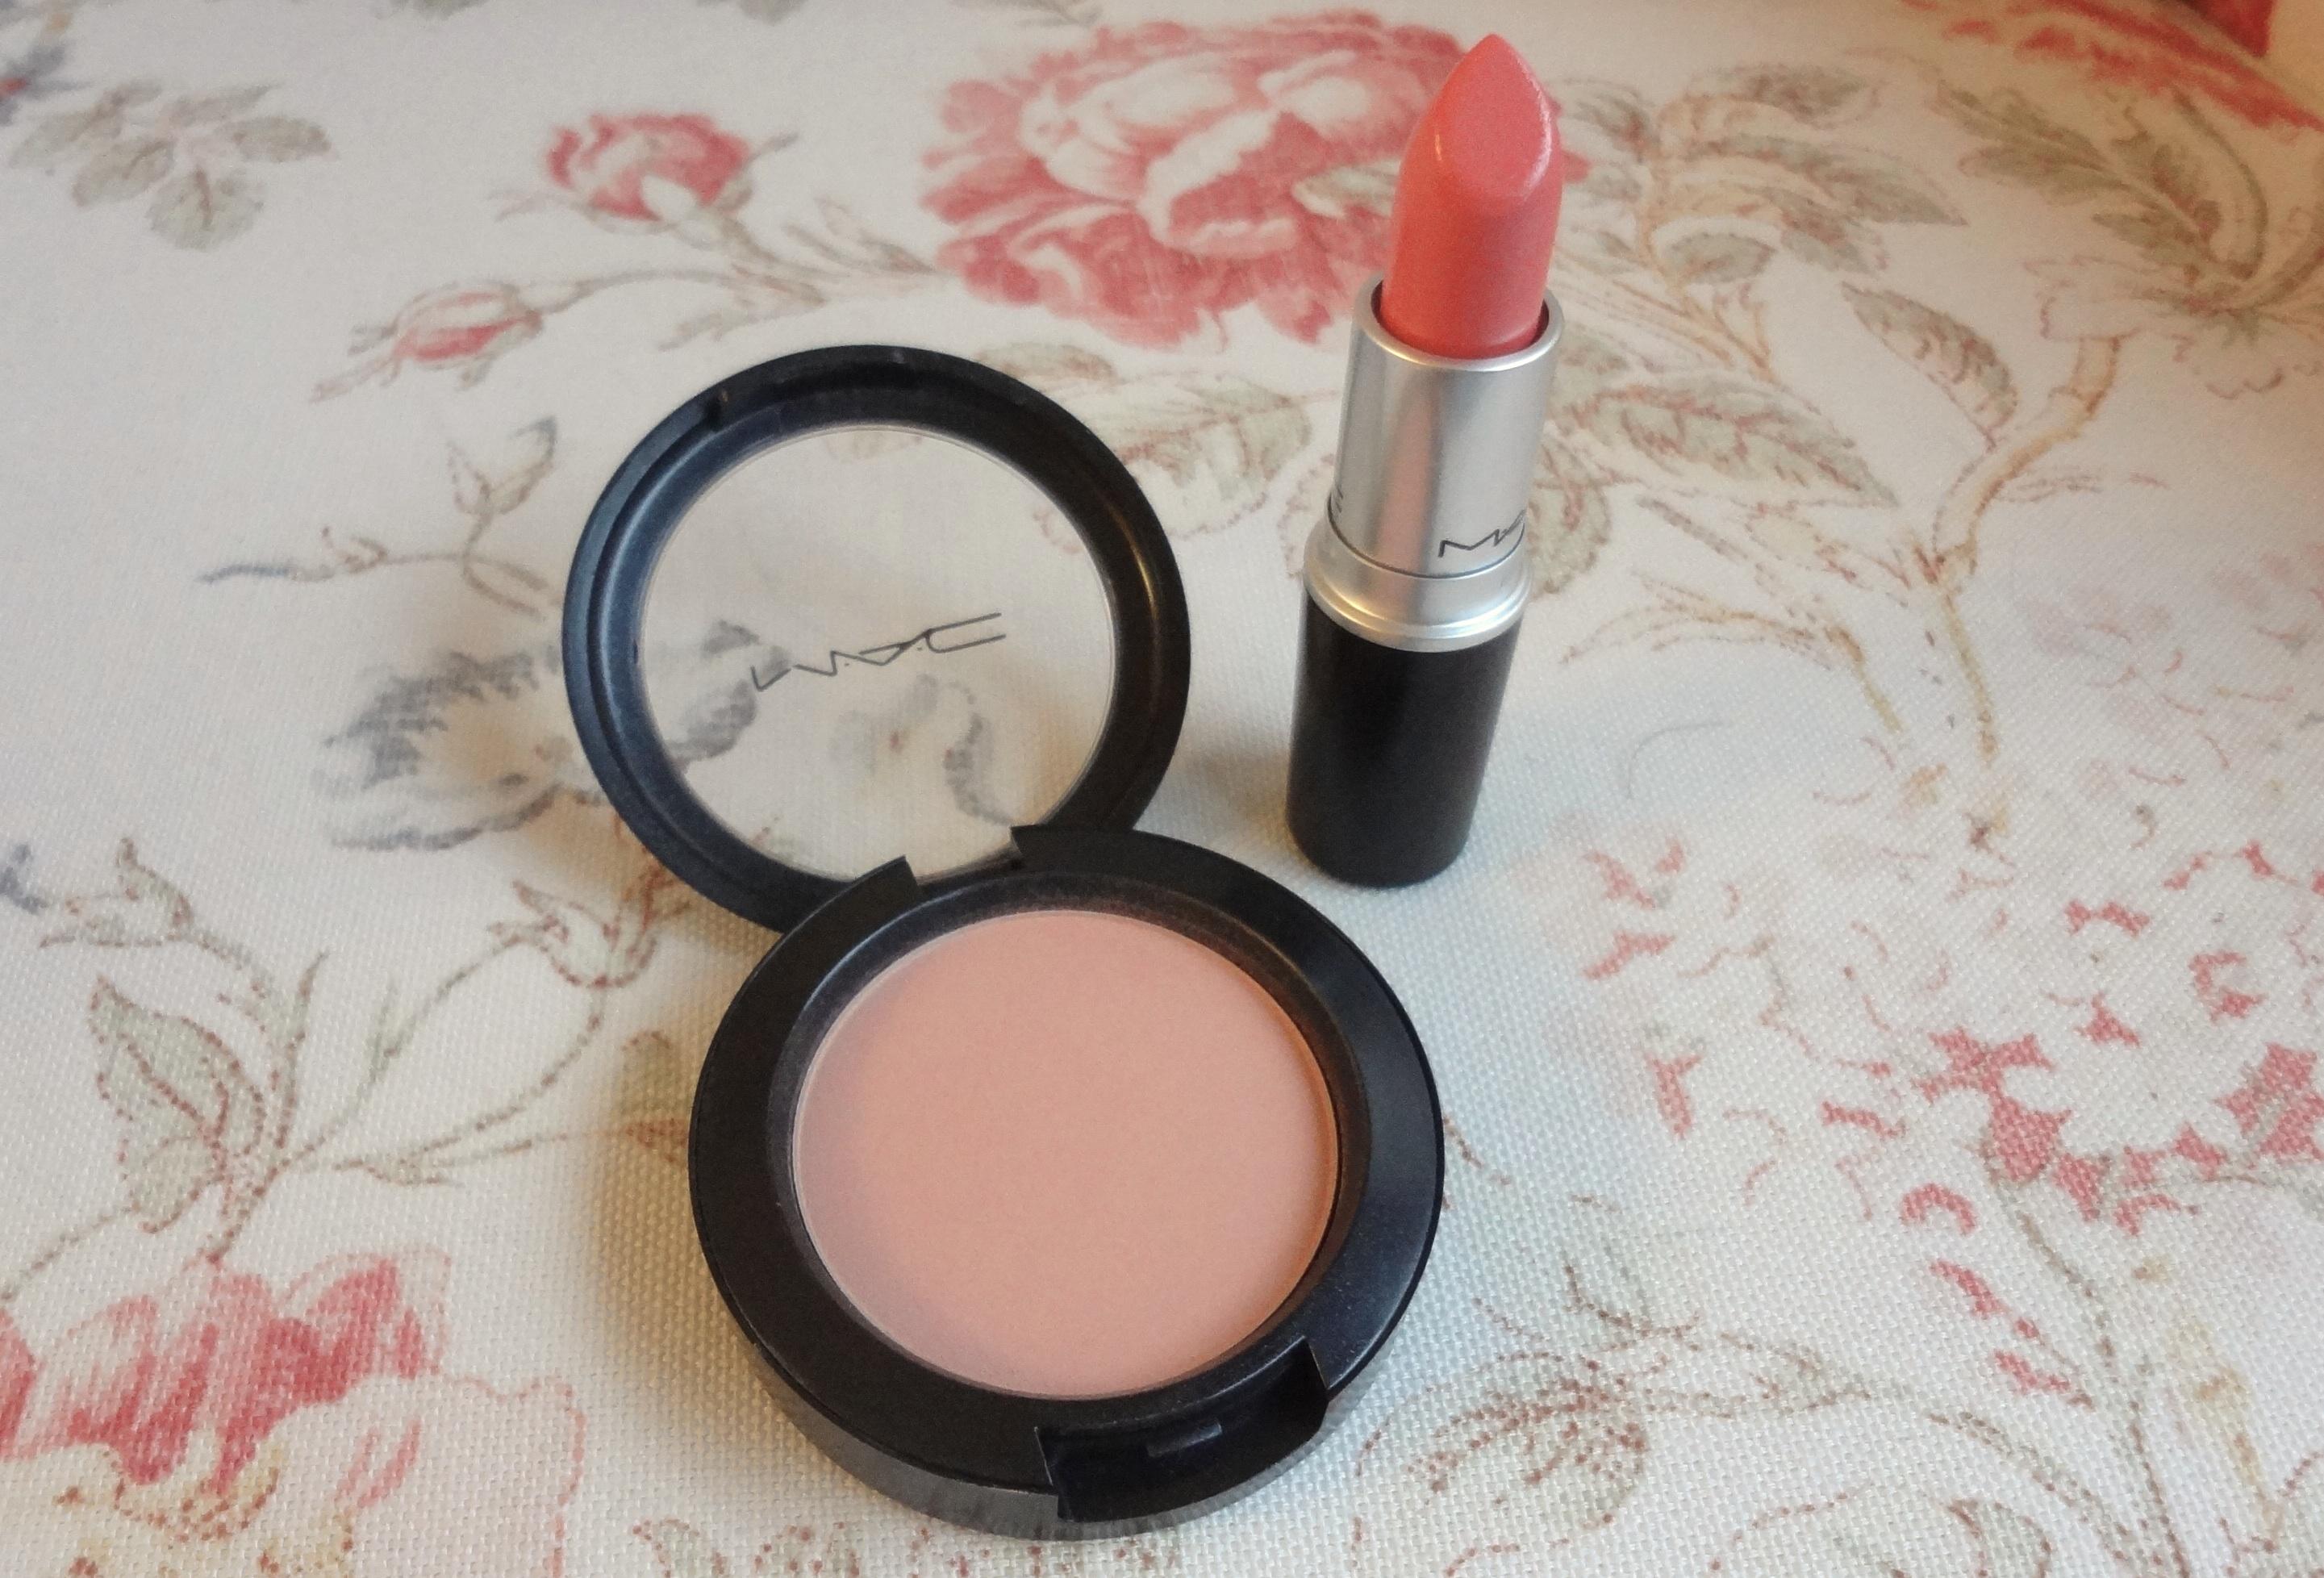 MAC Stay By Me Pro Longwear Blush & Coral Bliss Cremesheen ...